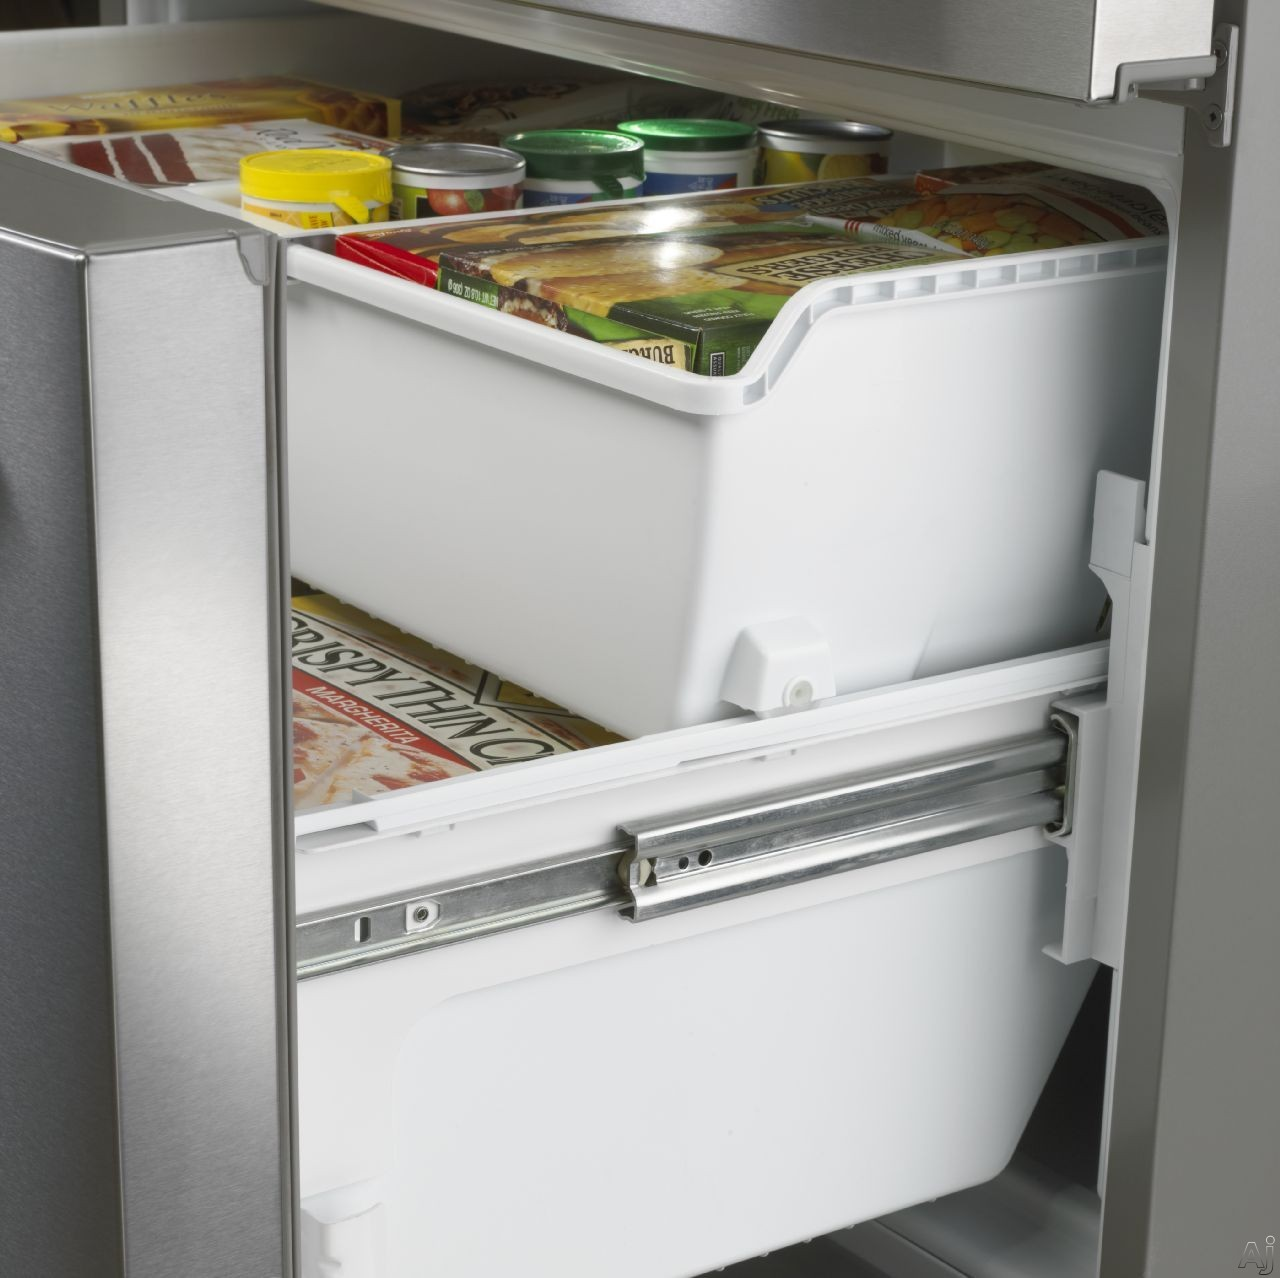 Maytag Mft2574dem 24 7 Cu Ft French Door Refrigerator With 5 Glass Shelves Gallon Door